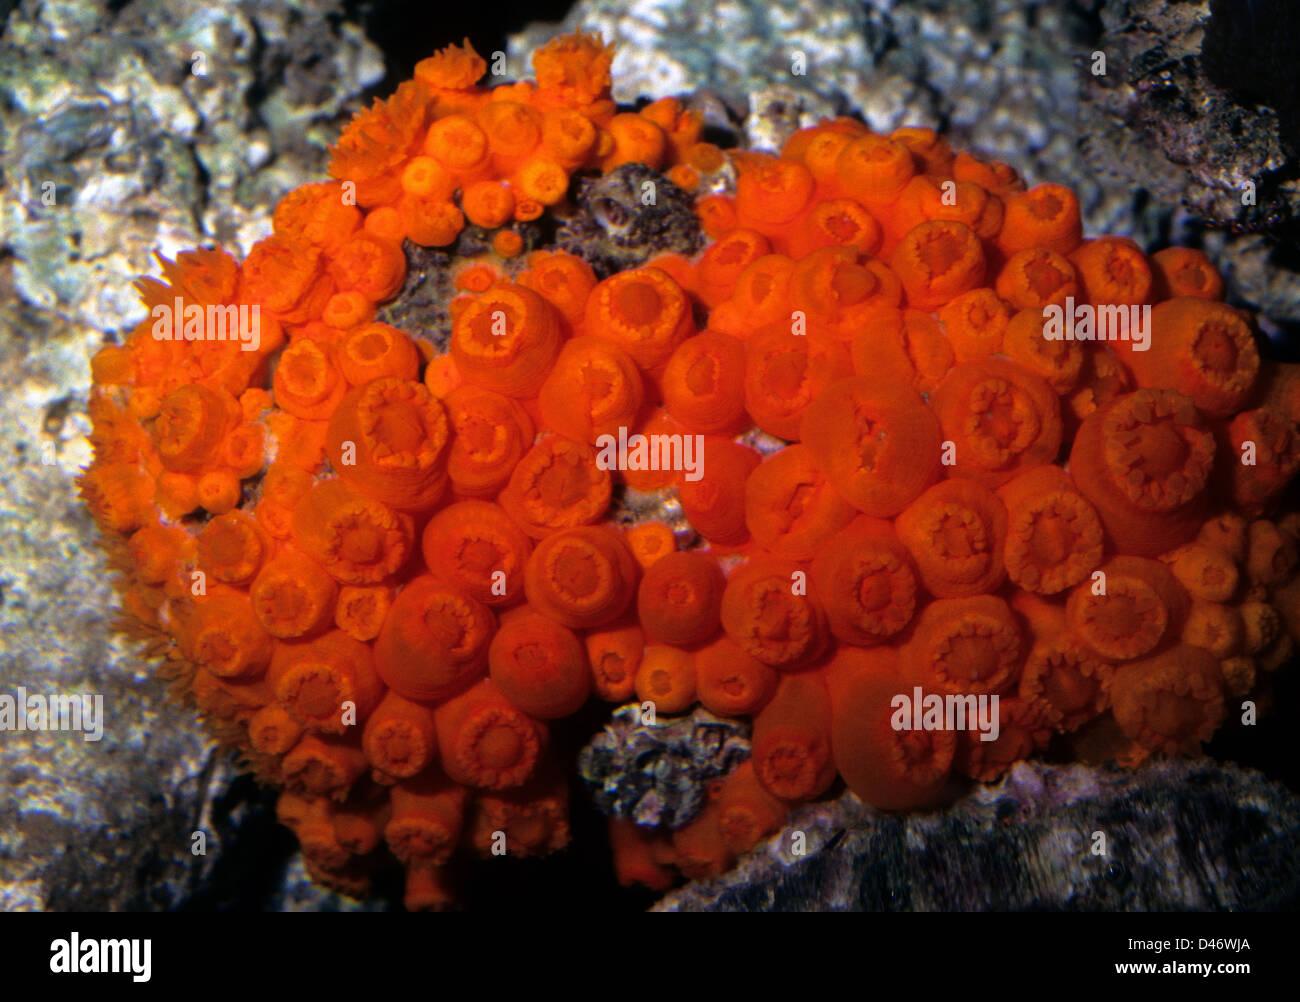 Sun Coral Tubastrea coccinea, Dendrophyllidae Indo-pacific ocean - Stock Image